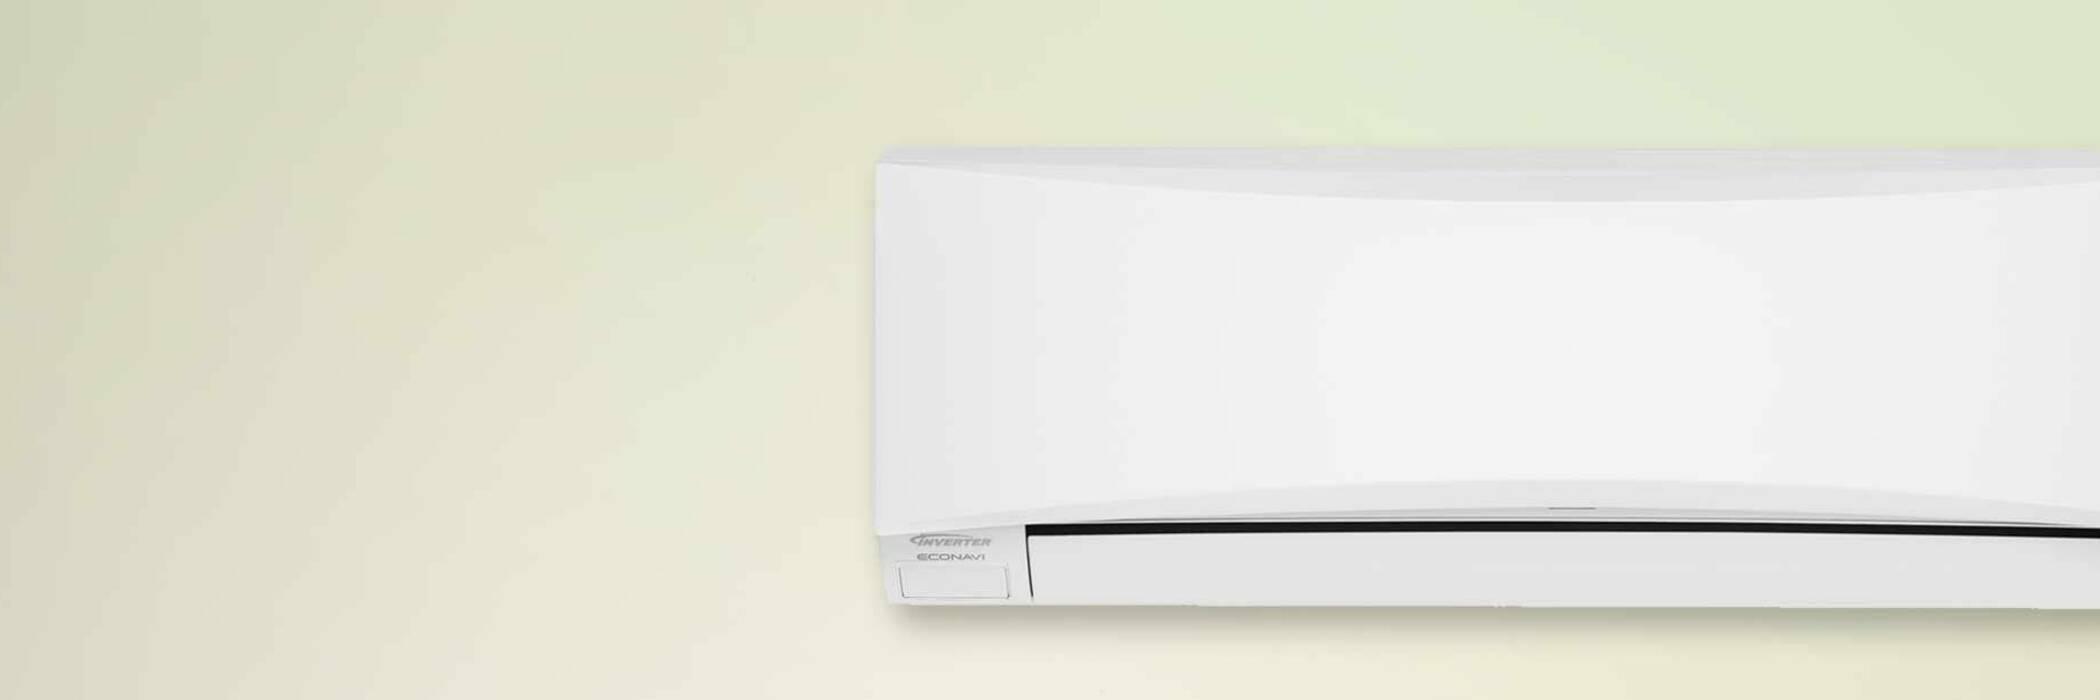 heat pump on wall